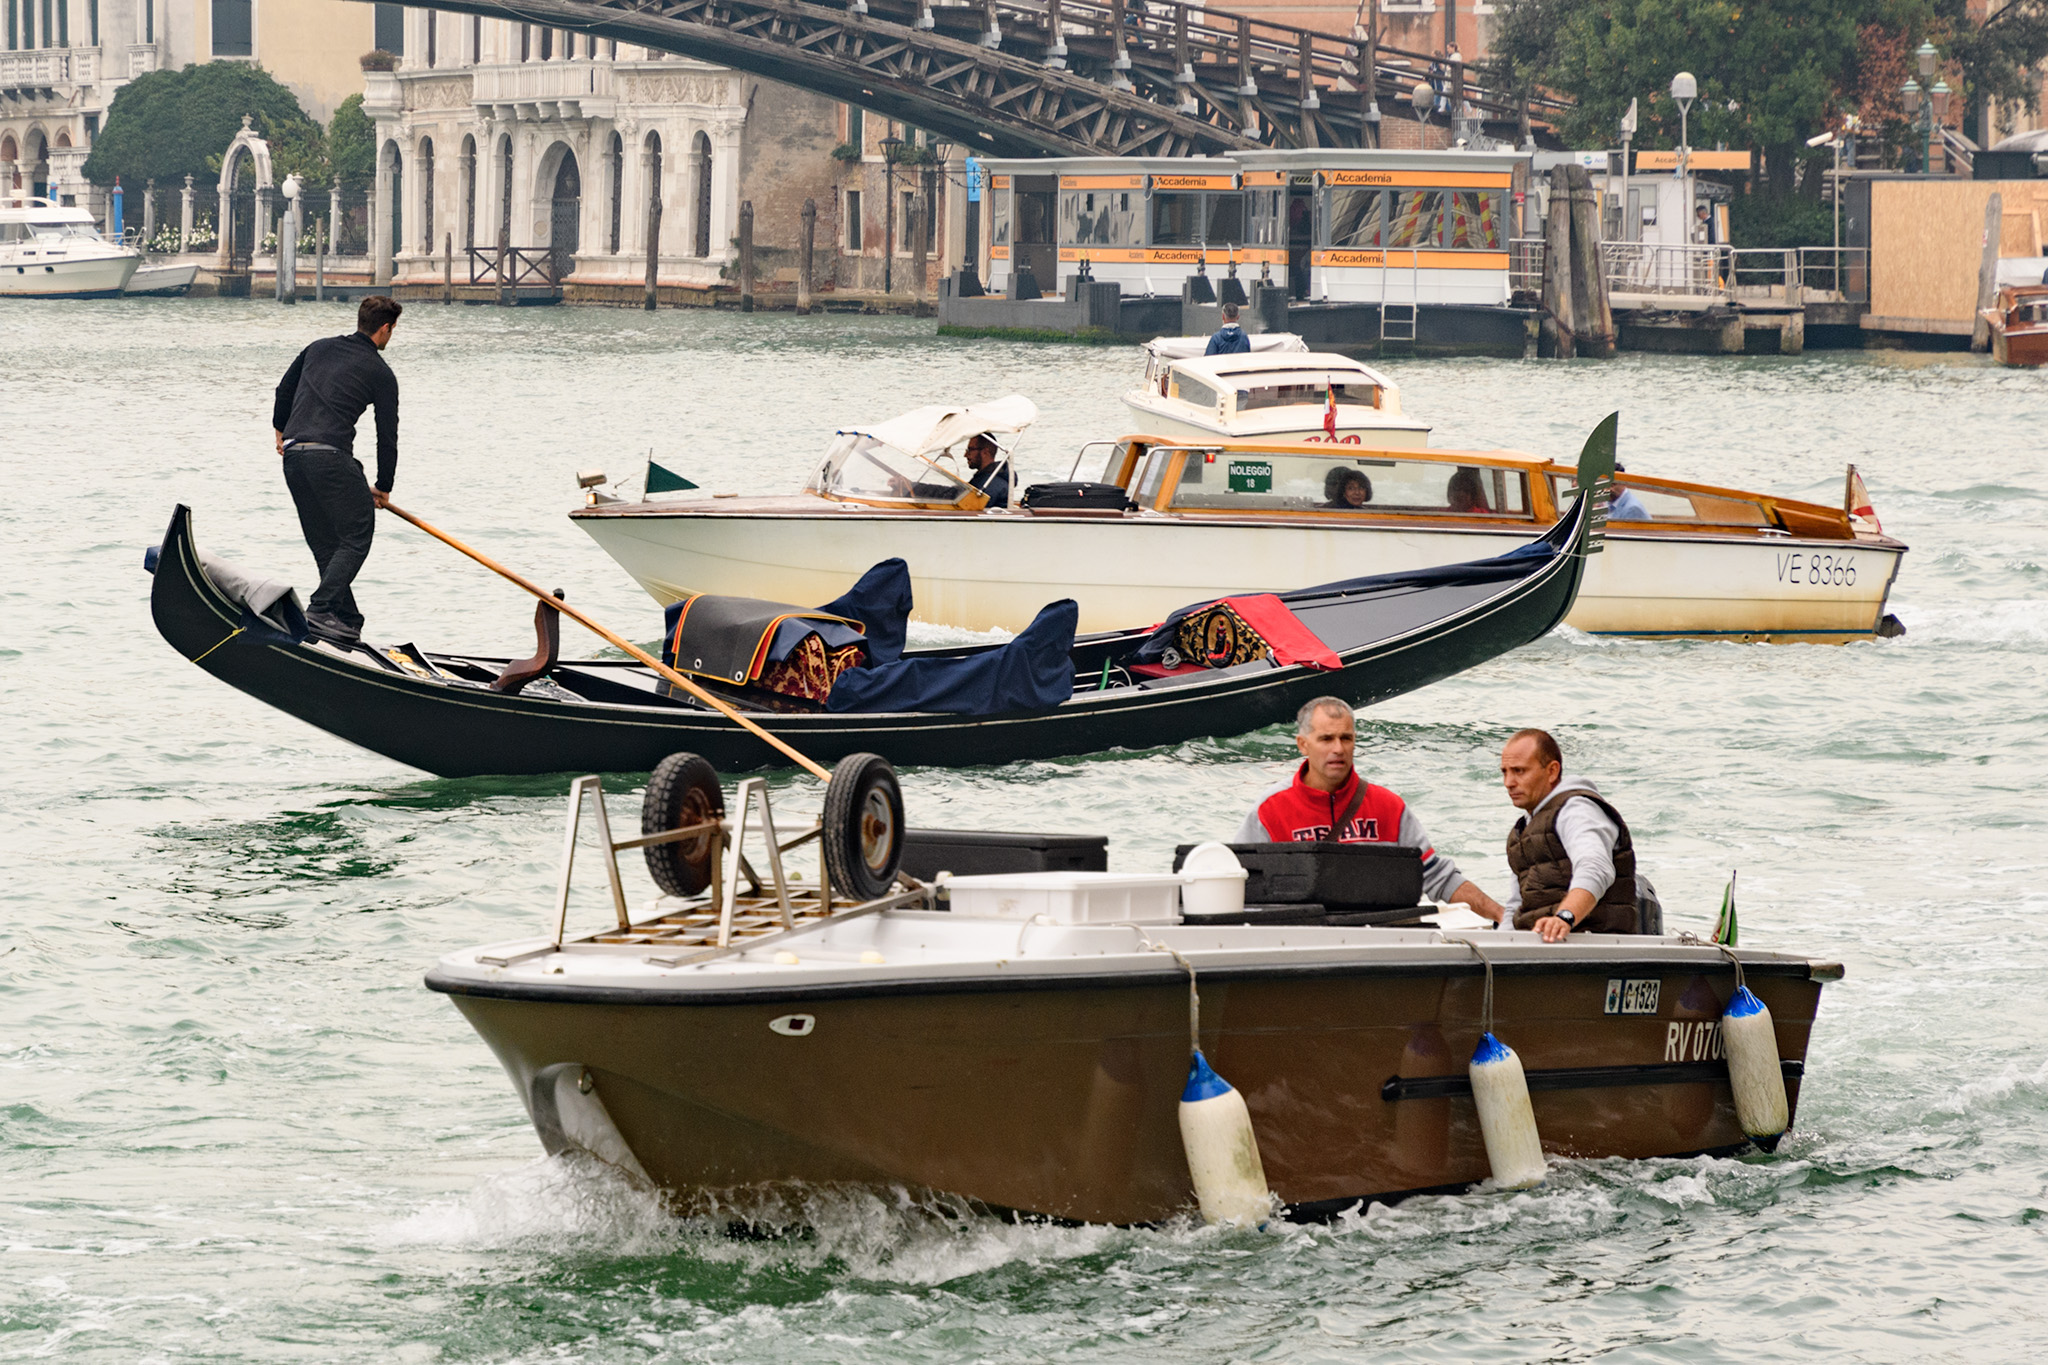 20171003 - Venice - 060.jpg